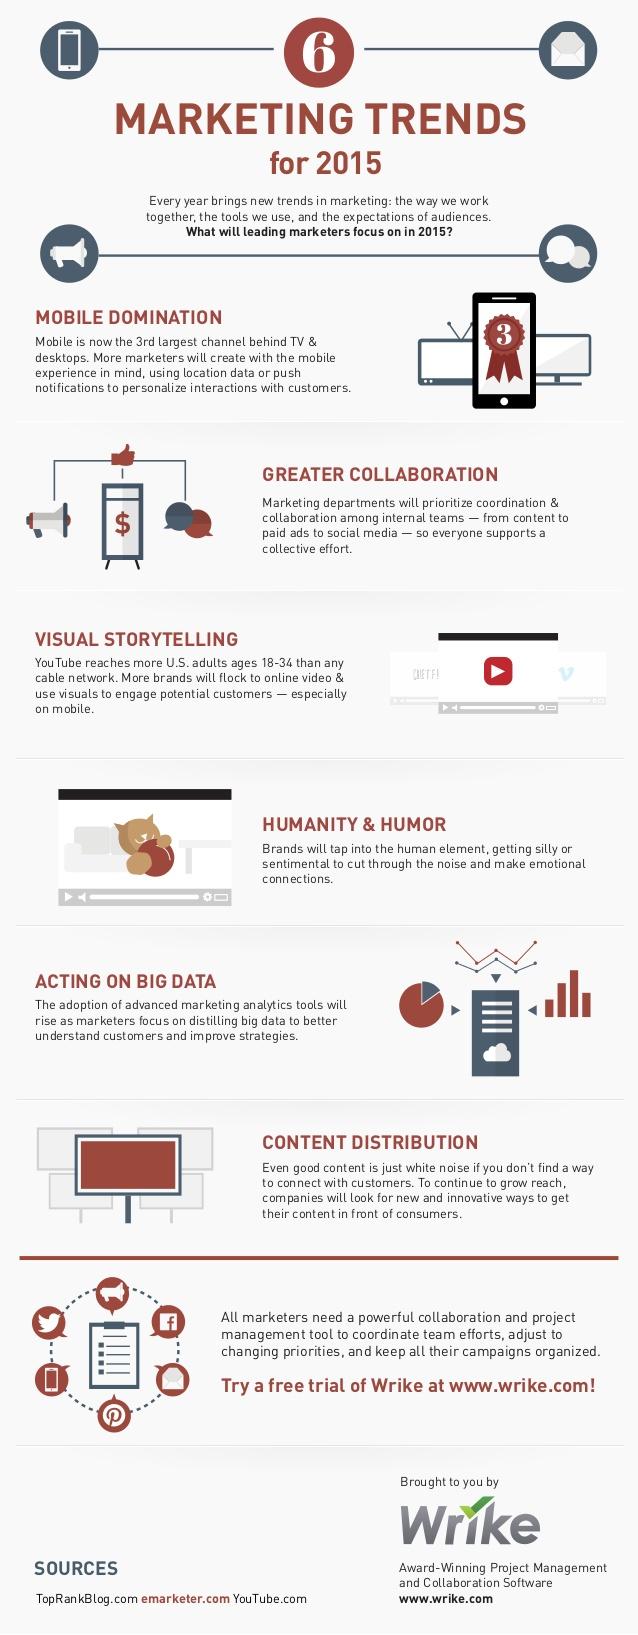 6 tendencias de marketing para 2015